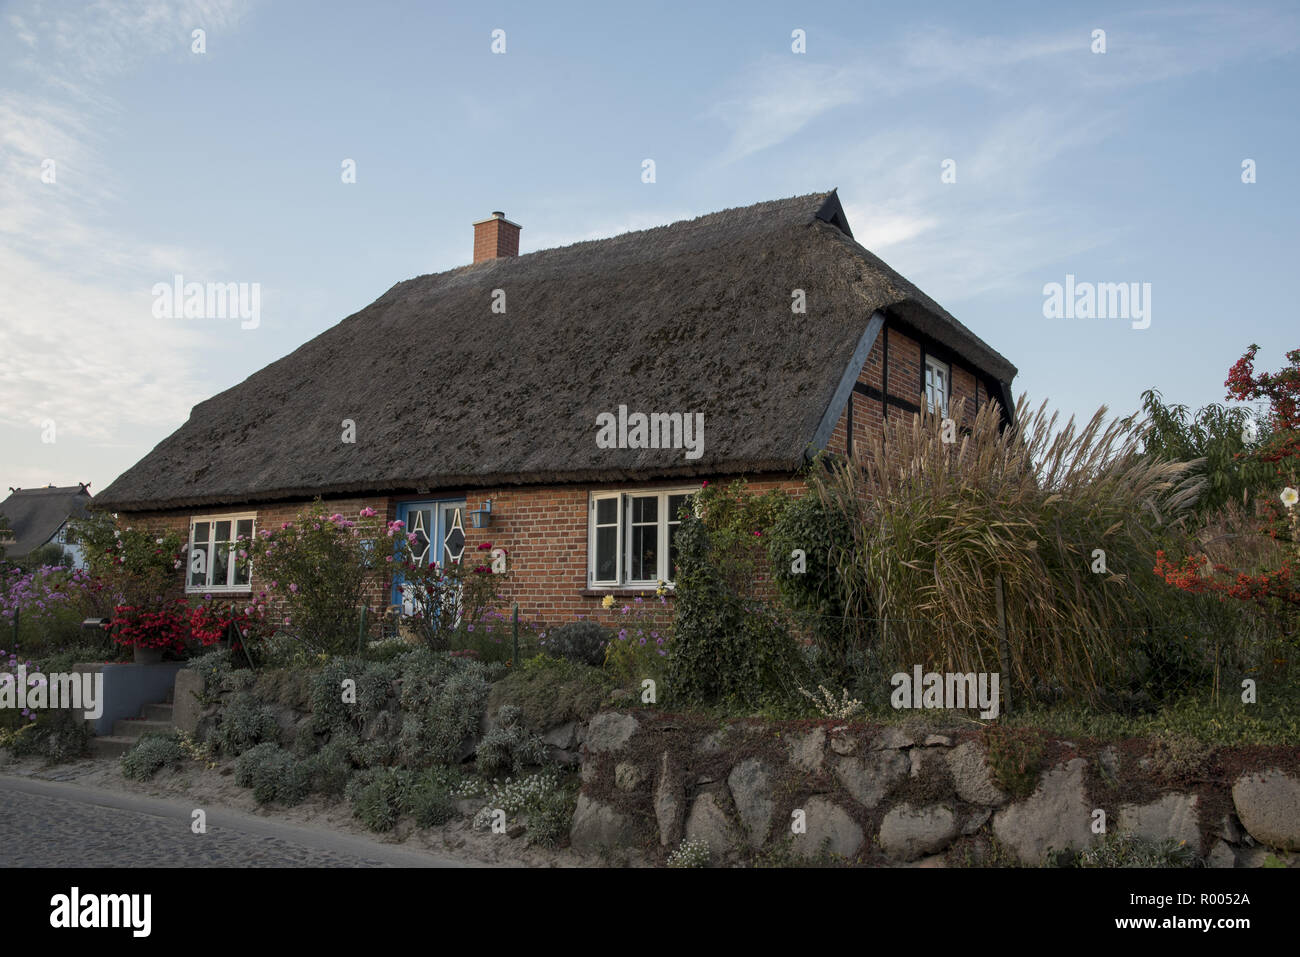 Thatch-roof house in Groß Zicker in southeastern part of Ruegen Island in the Baltic Sea in Northeastern Germany.  Ein mit Reet gedecktes Haus in Groß Stock Photo